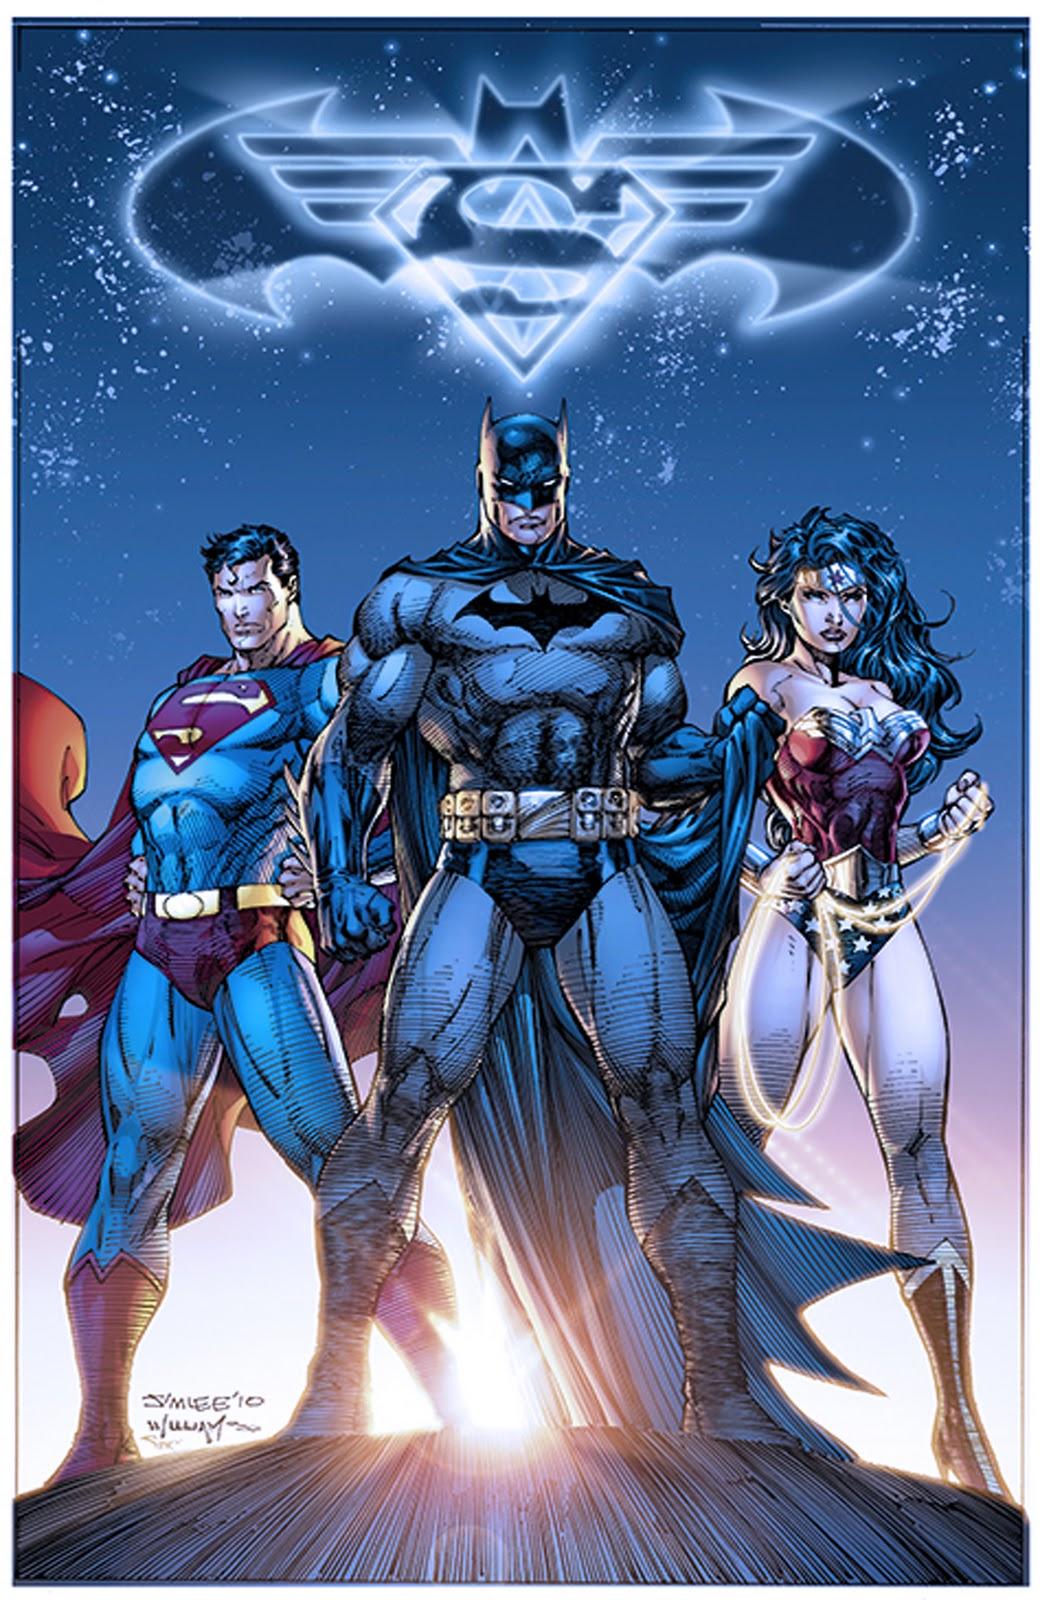 52 Photos 37 Reviews: DC New 52 Wallpaper